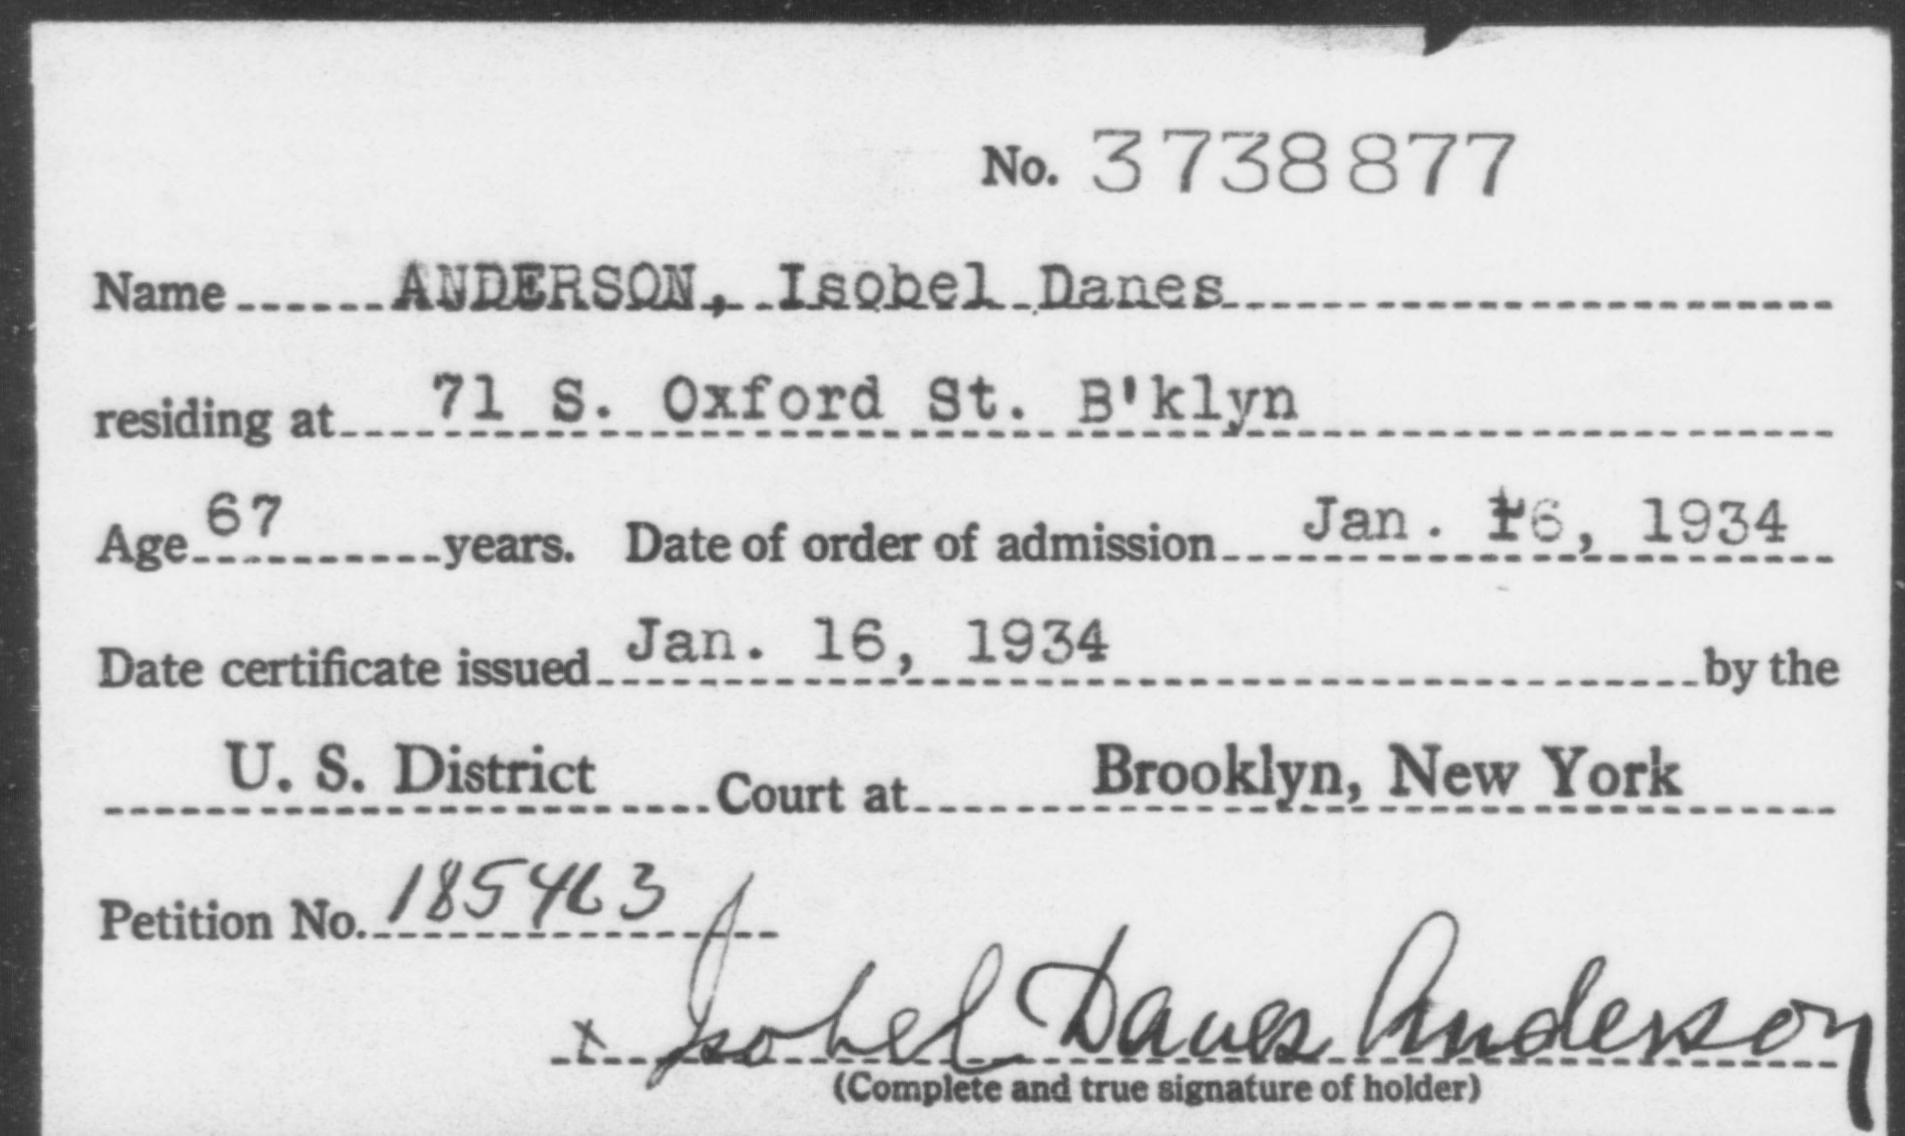 ANDERSON, Isobel Danes - Born: [Age], Naturalized: 1934